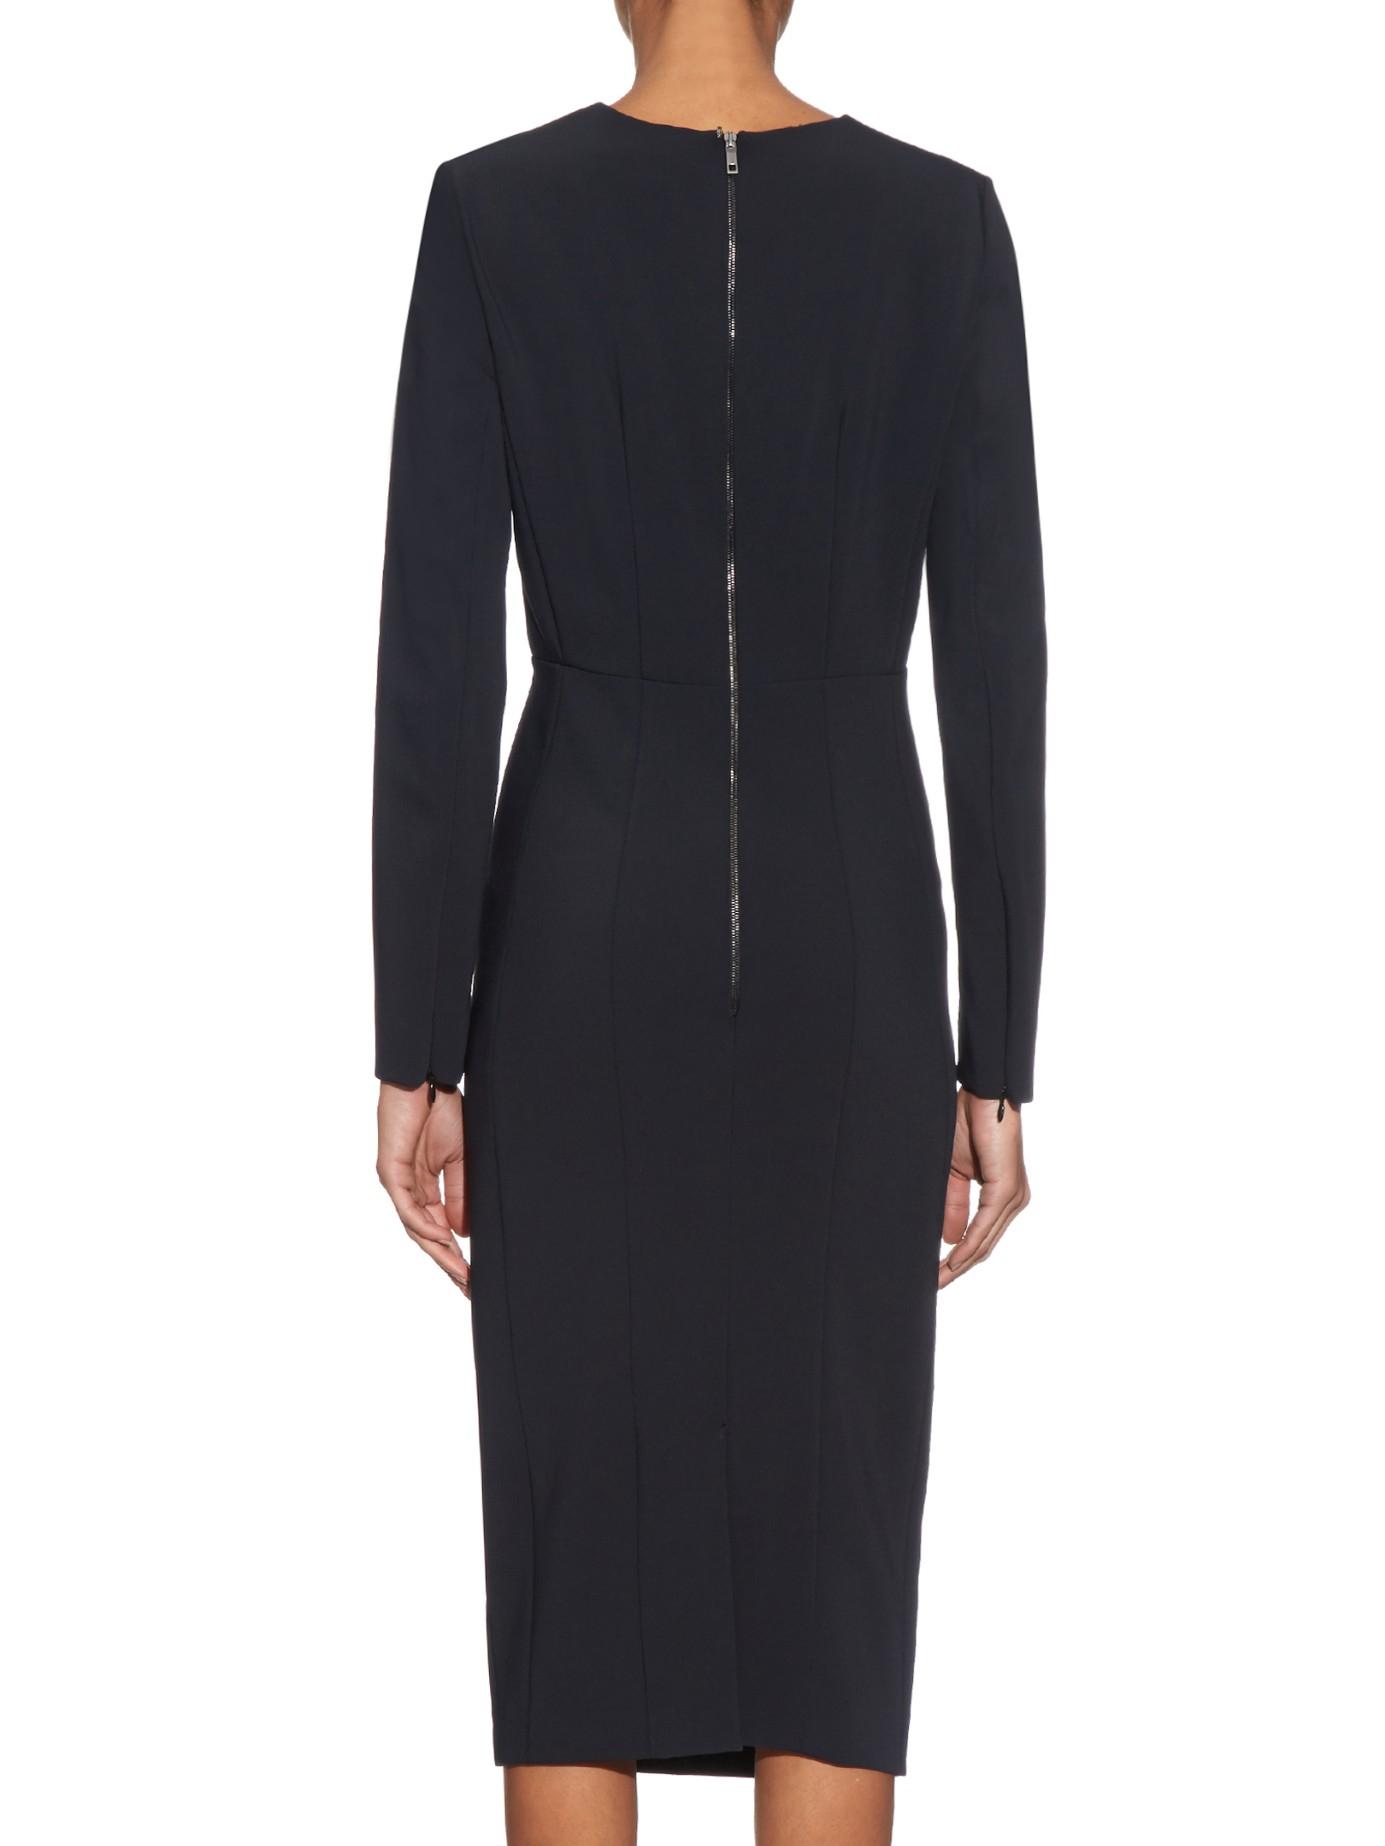 Sportmax Ventoso Stretch Crepe Dress In Black Lyst